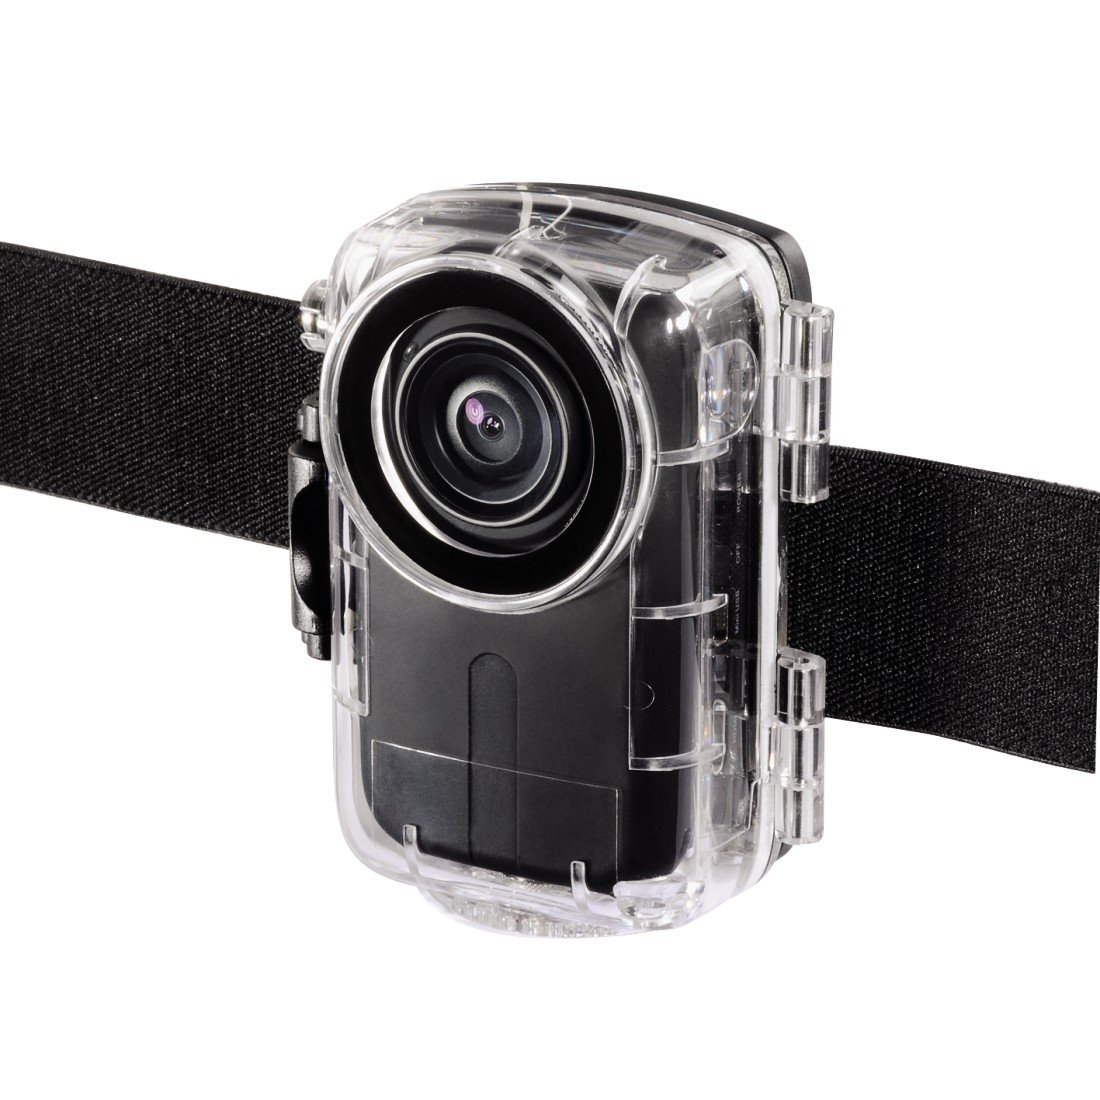 Hama HD Daytour Action-Cam (8 Megapixel